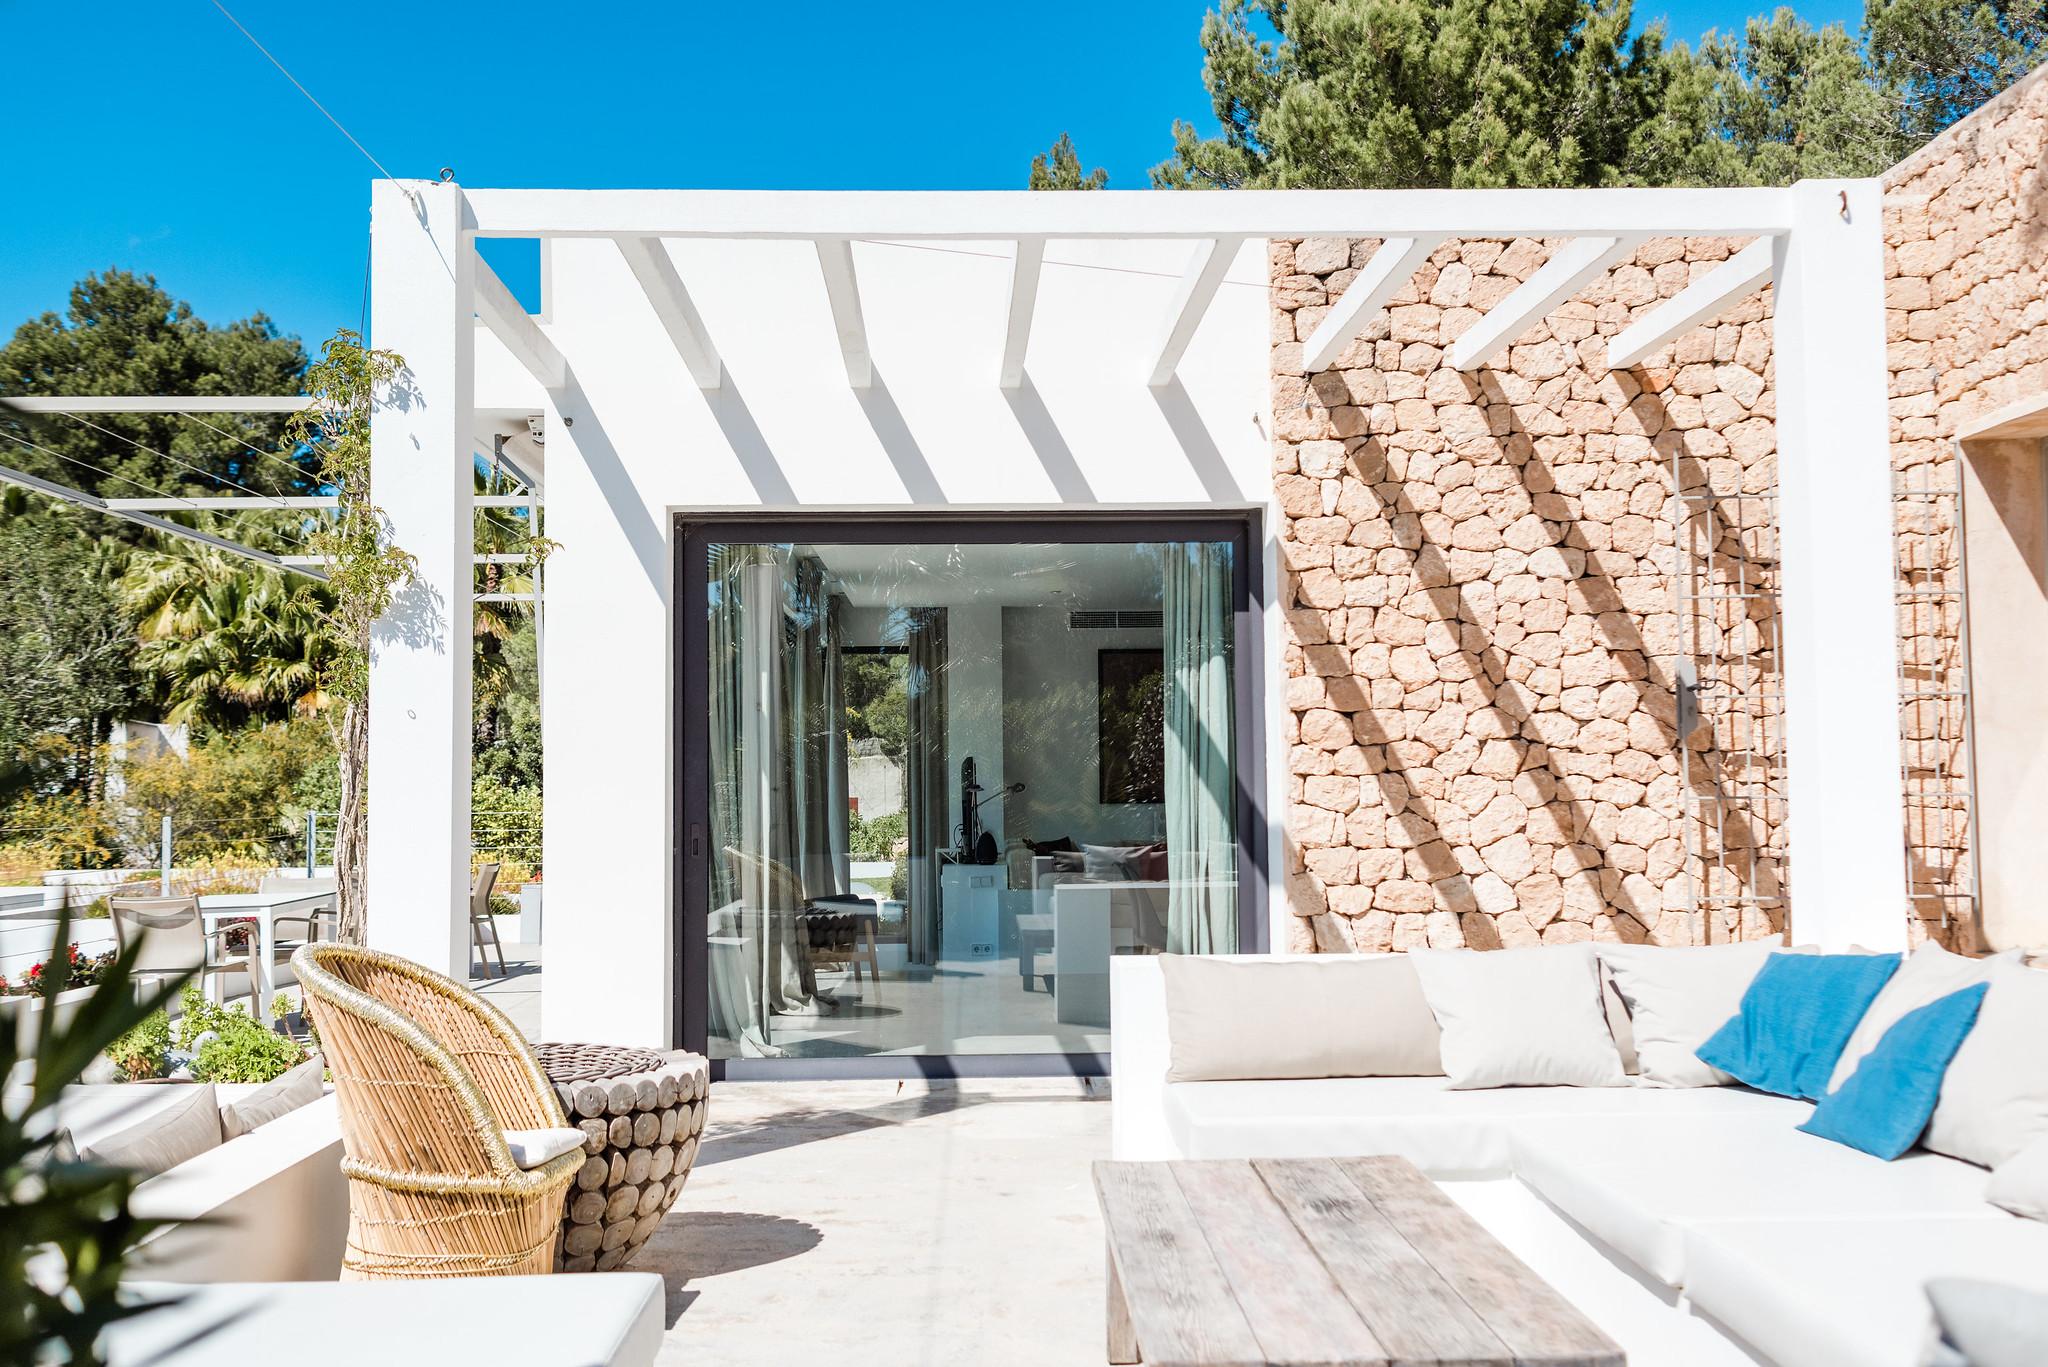 https://www.white-ibiza.com/wp-content/uploads/2020/06/white-ibiza-villas-casa-nyah-exterior-soutside-seating2.jpg